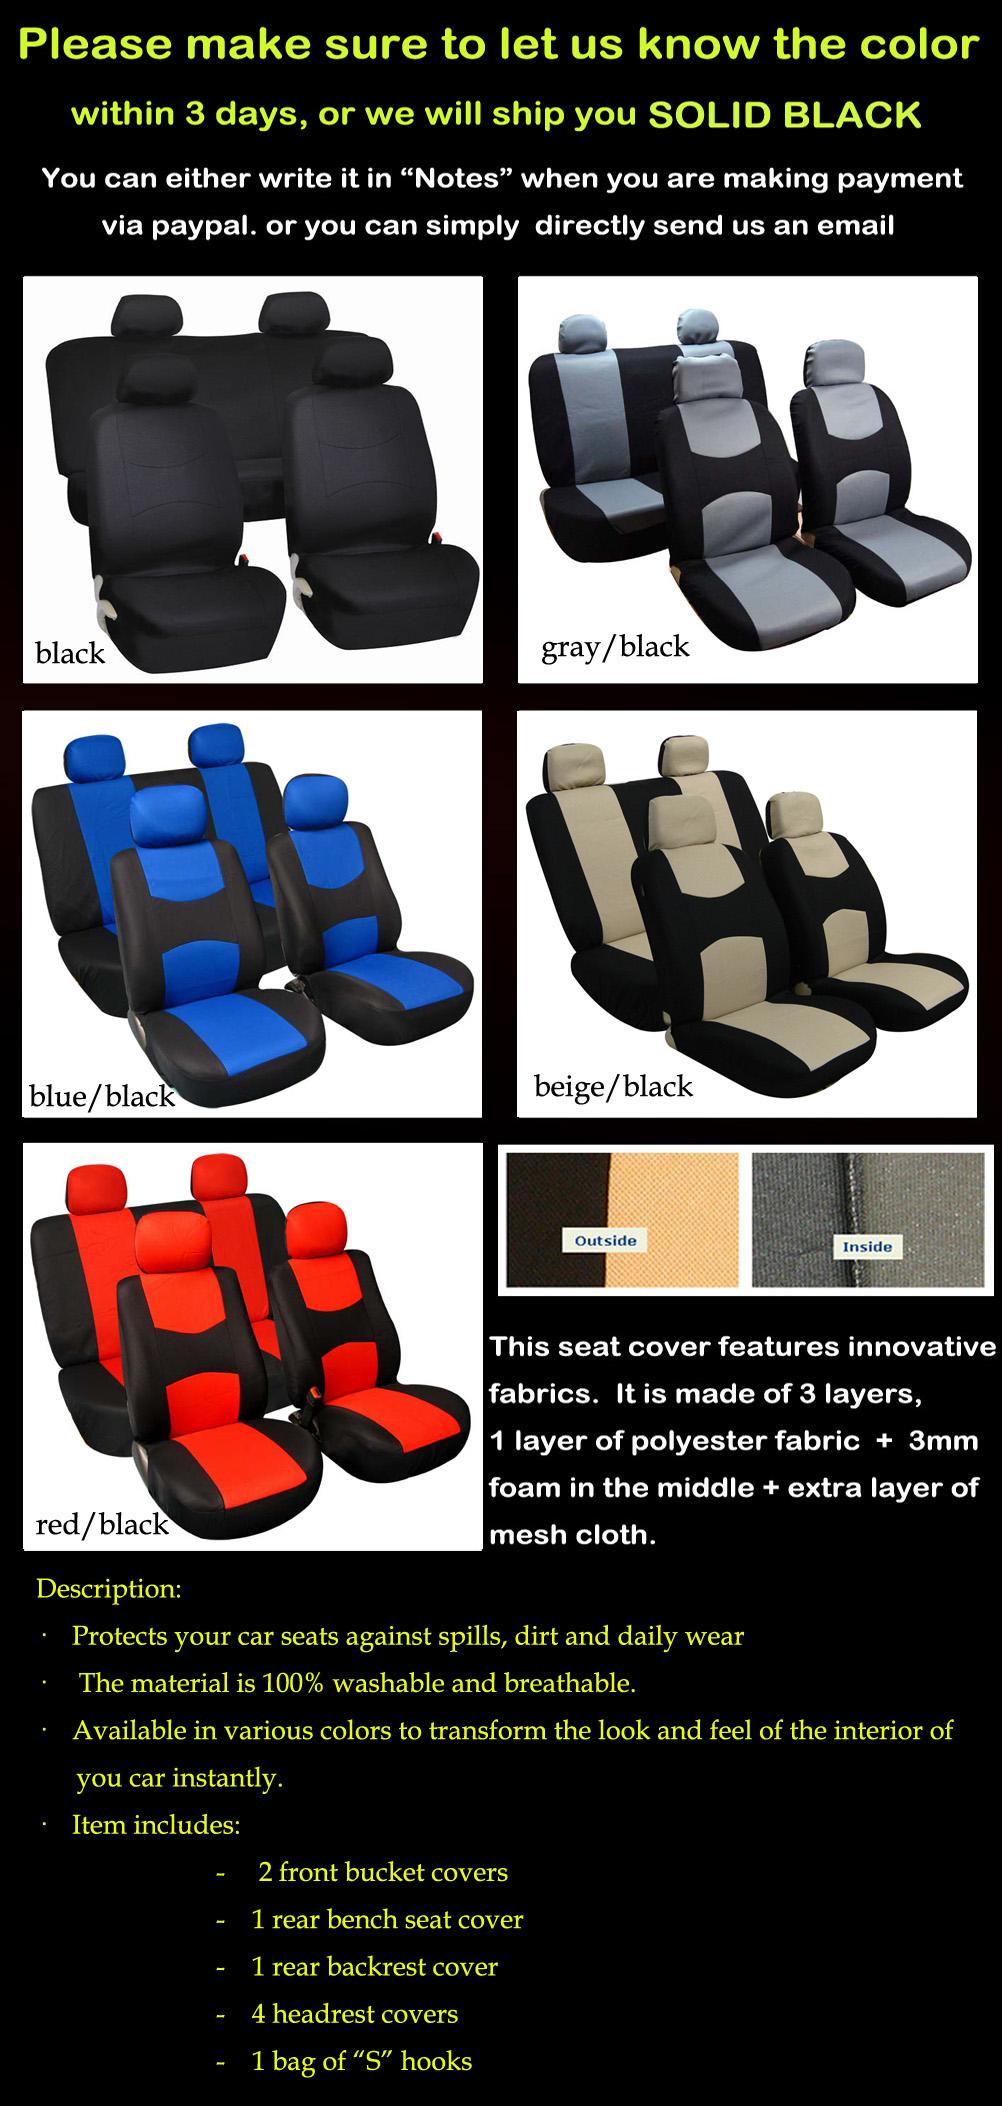 Bestfh Com 2010 Kia Forte Car Seat Cover Car Seat Covers 4e